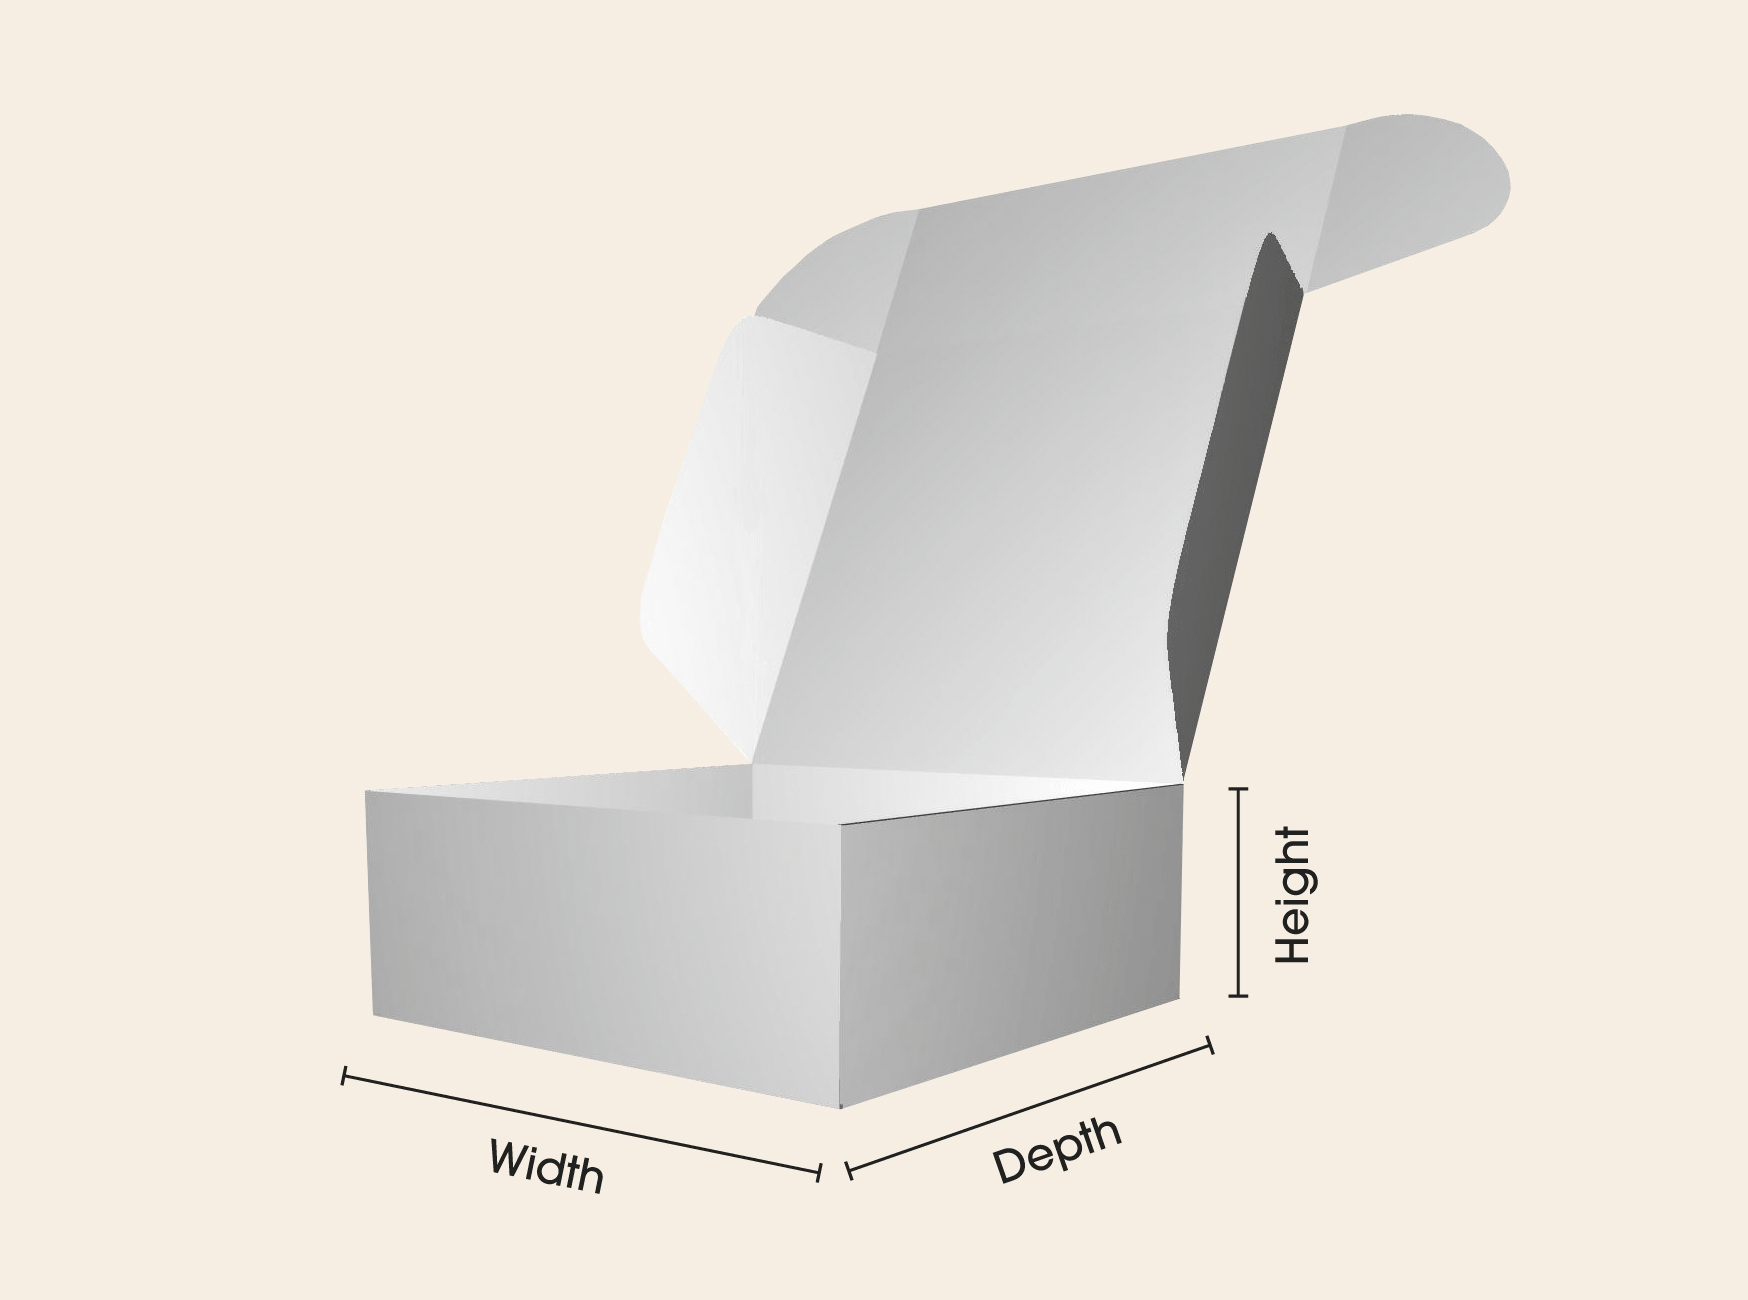 Box printing sizes